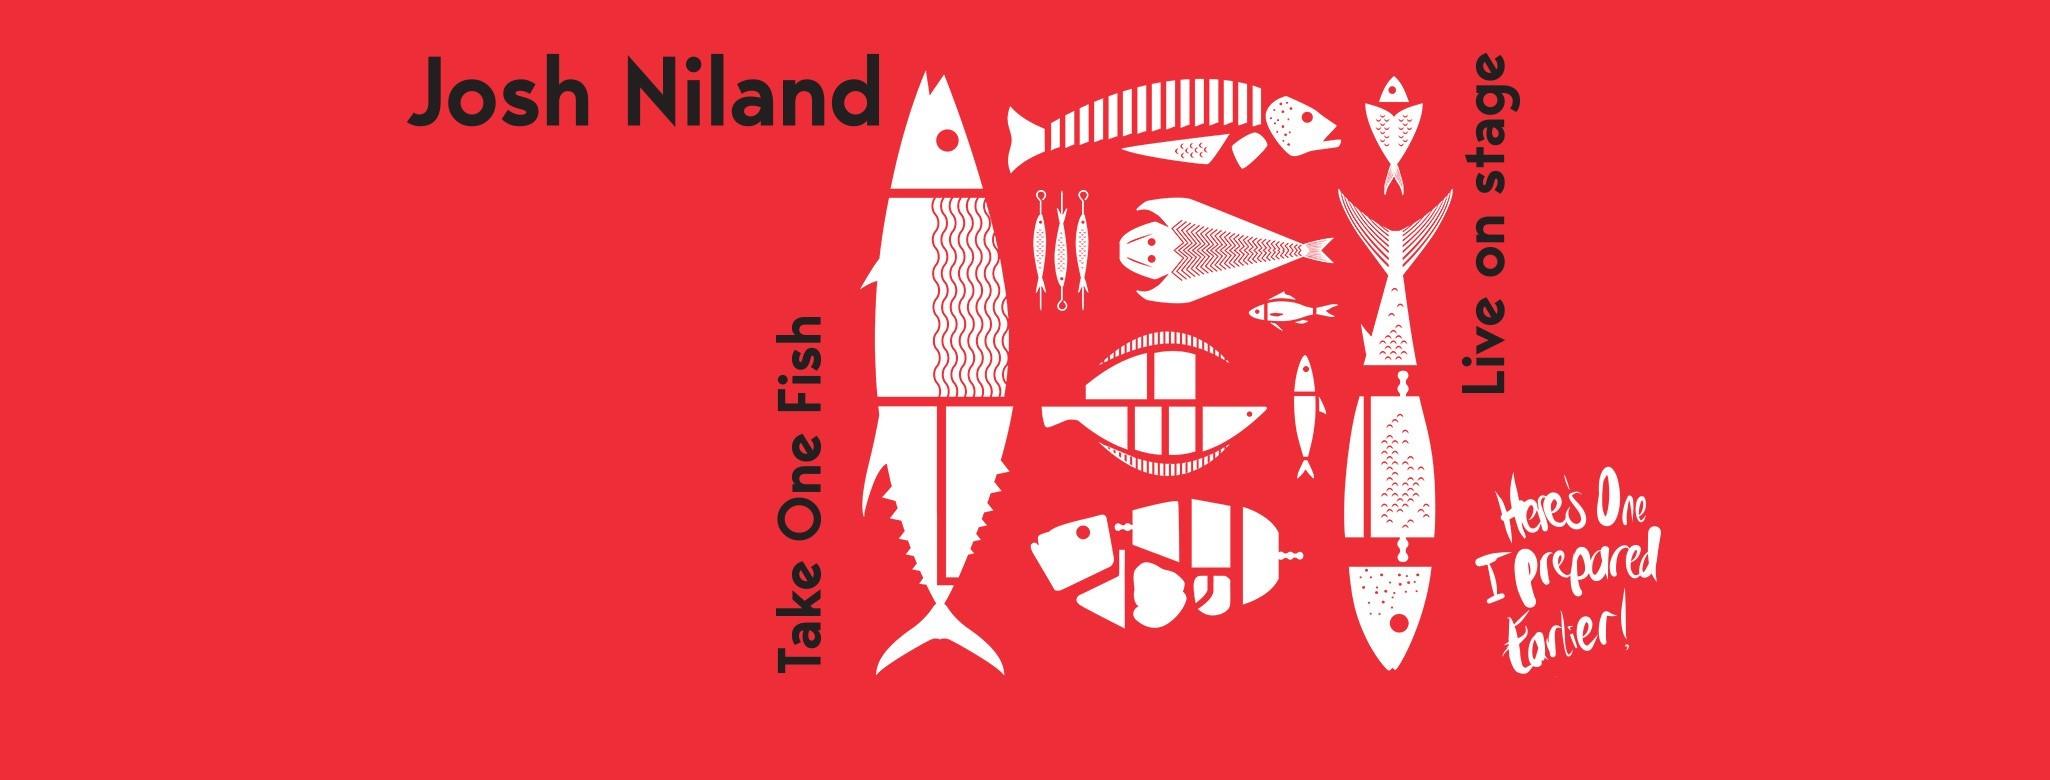 """Take One Fish"" Butchery Masterclass by Josh Niland"